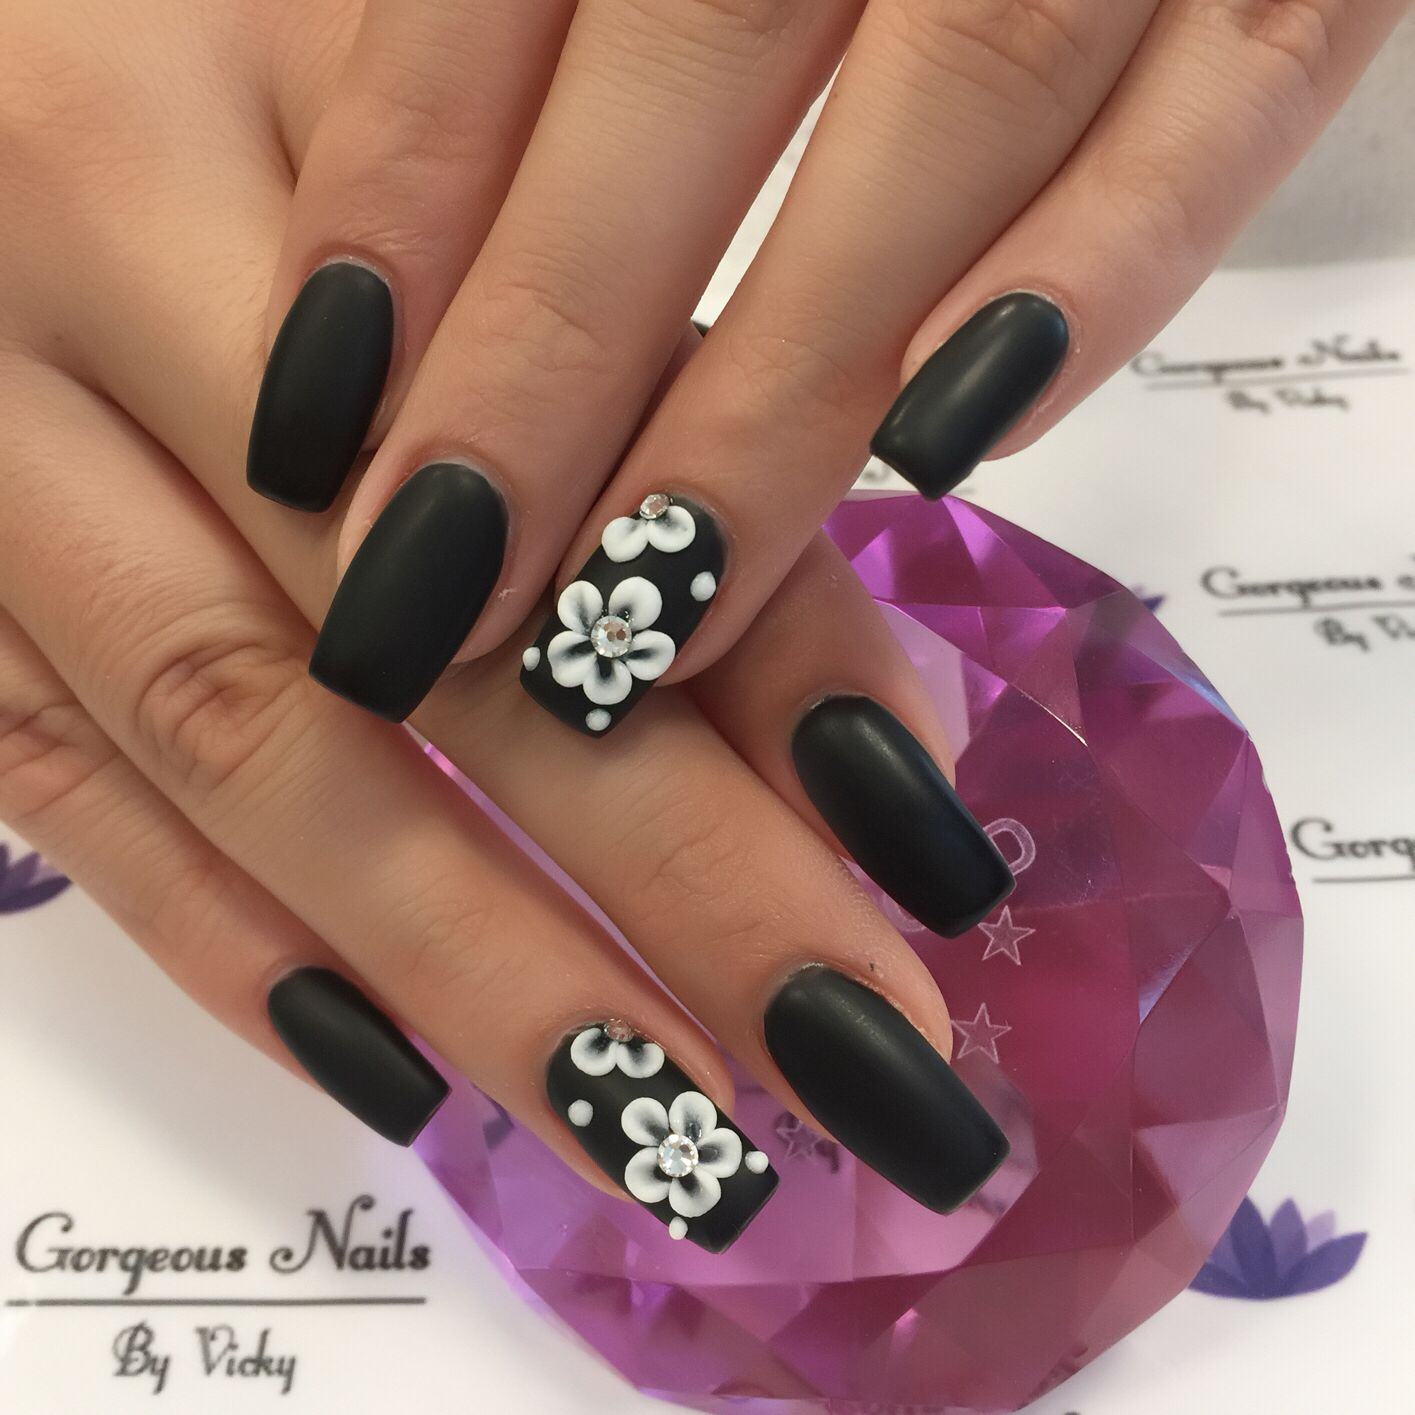 Black gel polish vs 3D flowers | Gorgeous nails by Vicky | Pinterest ...